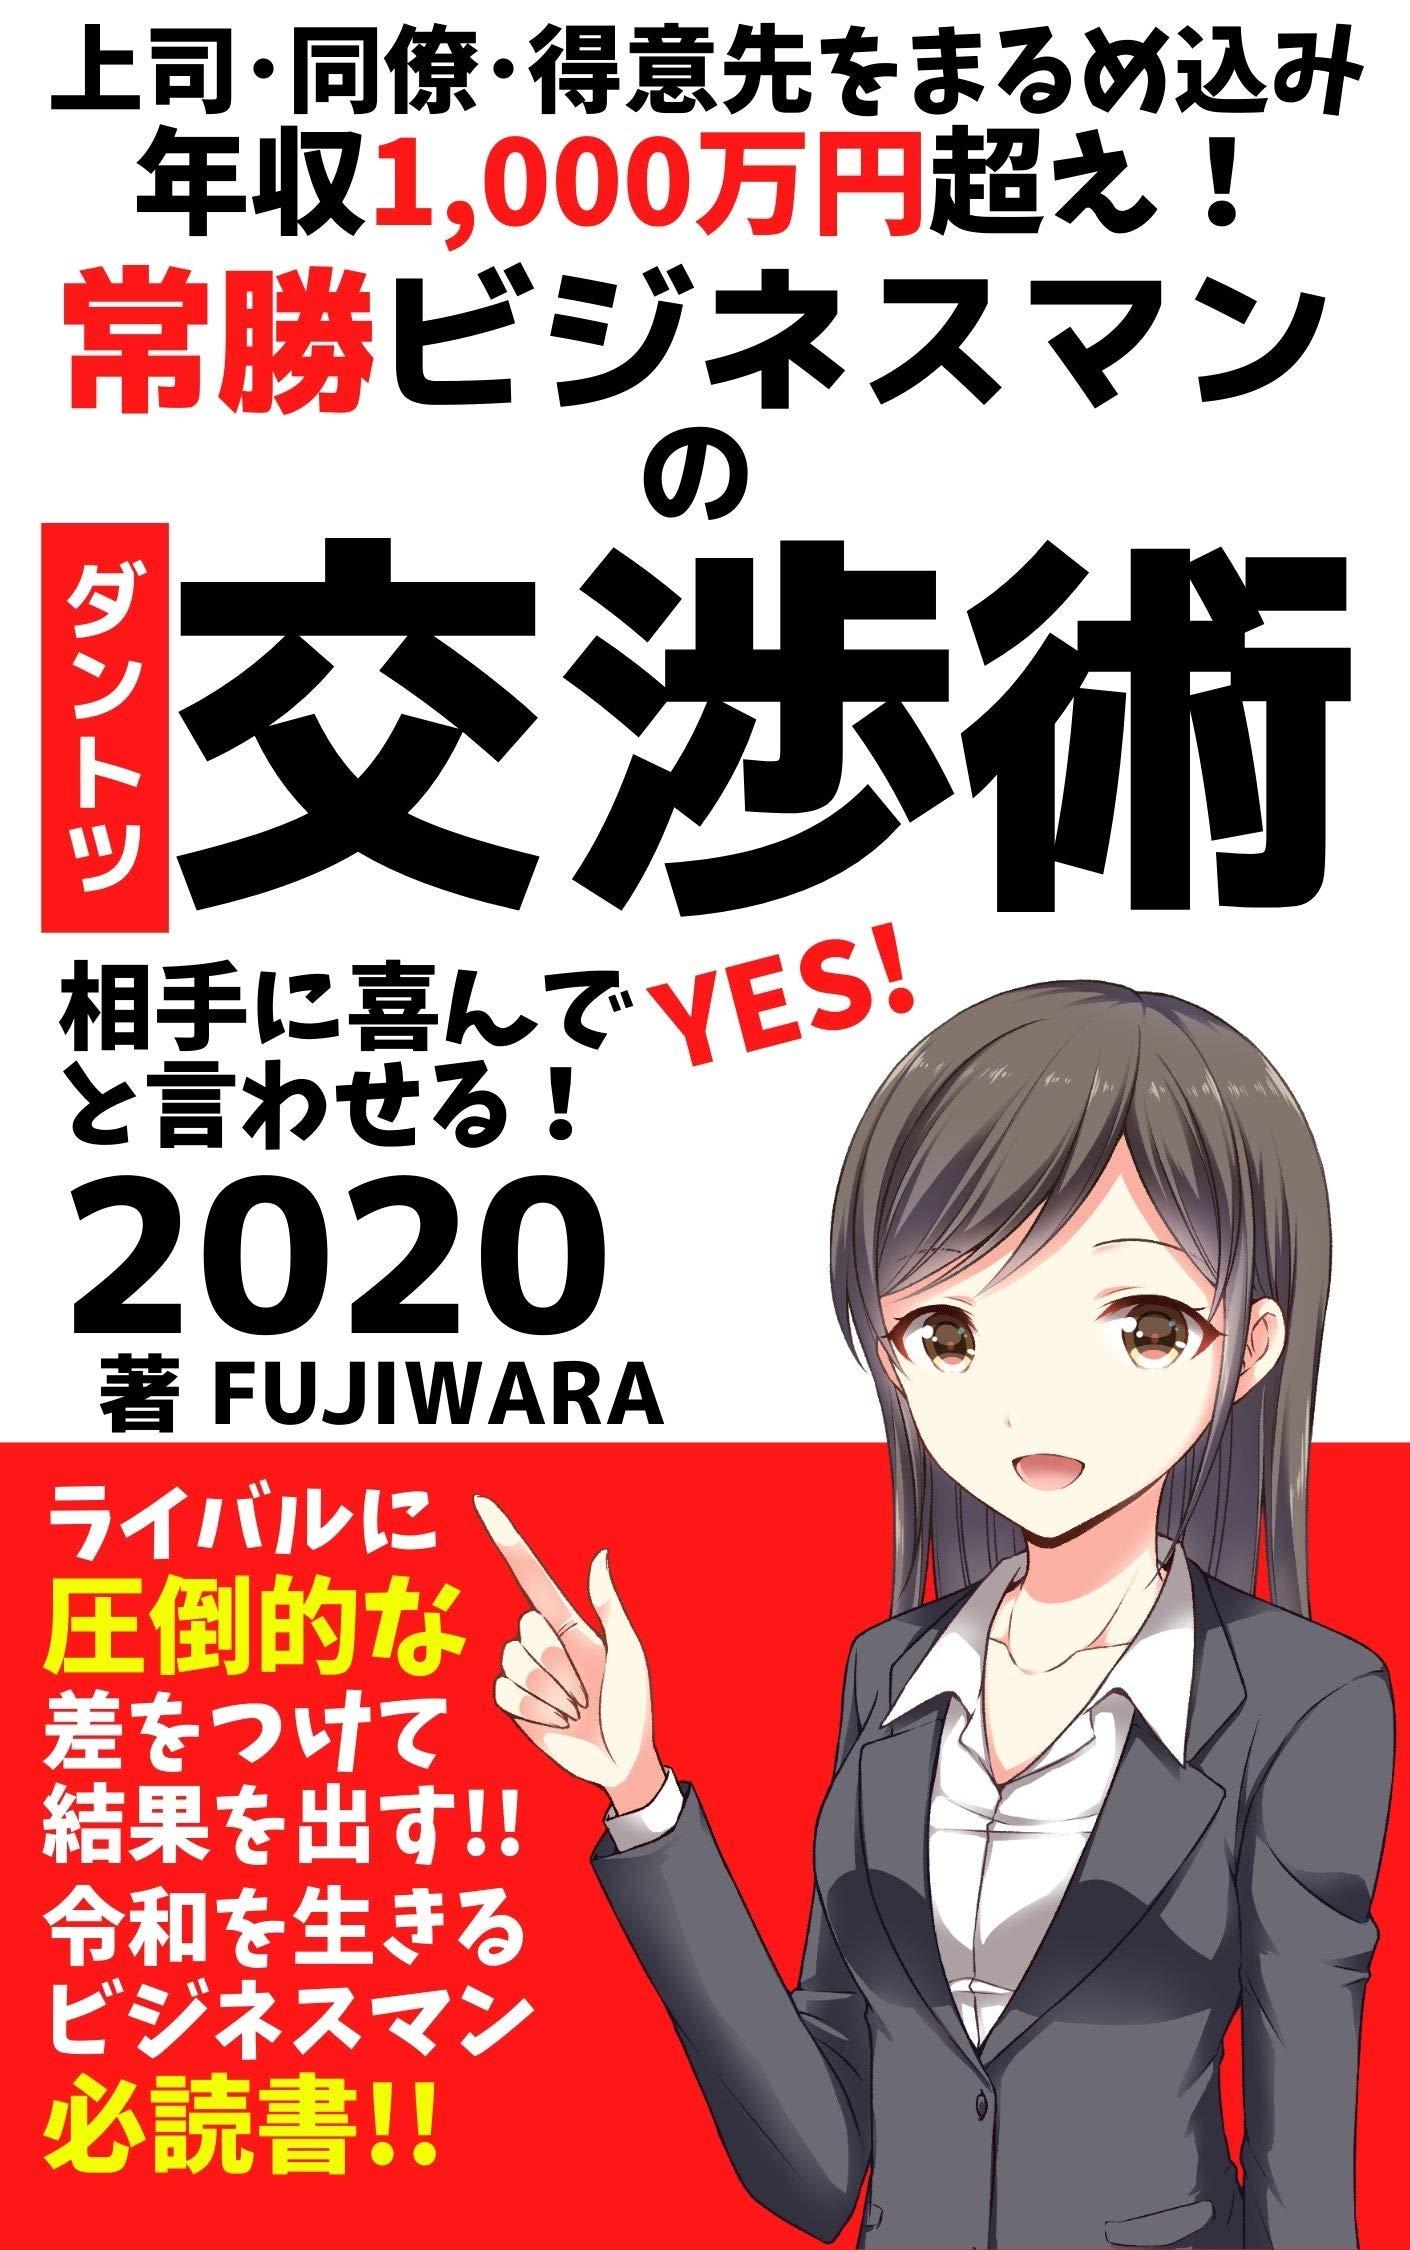 jyousyoubijinesumannnodantotsukousyoujyutu: jyoushidouryoutokuisakiwomarumekominensyu1000manengoe (Japanese Edition)